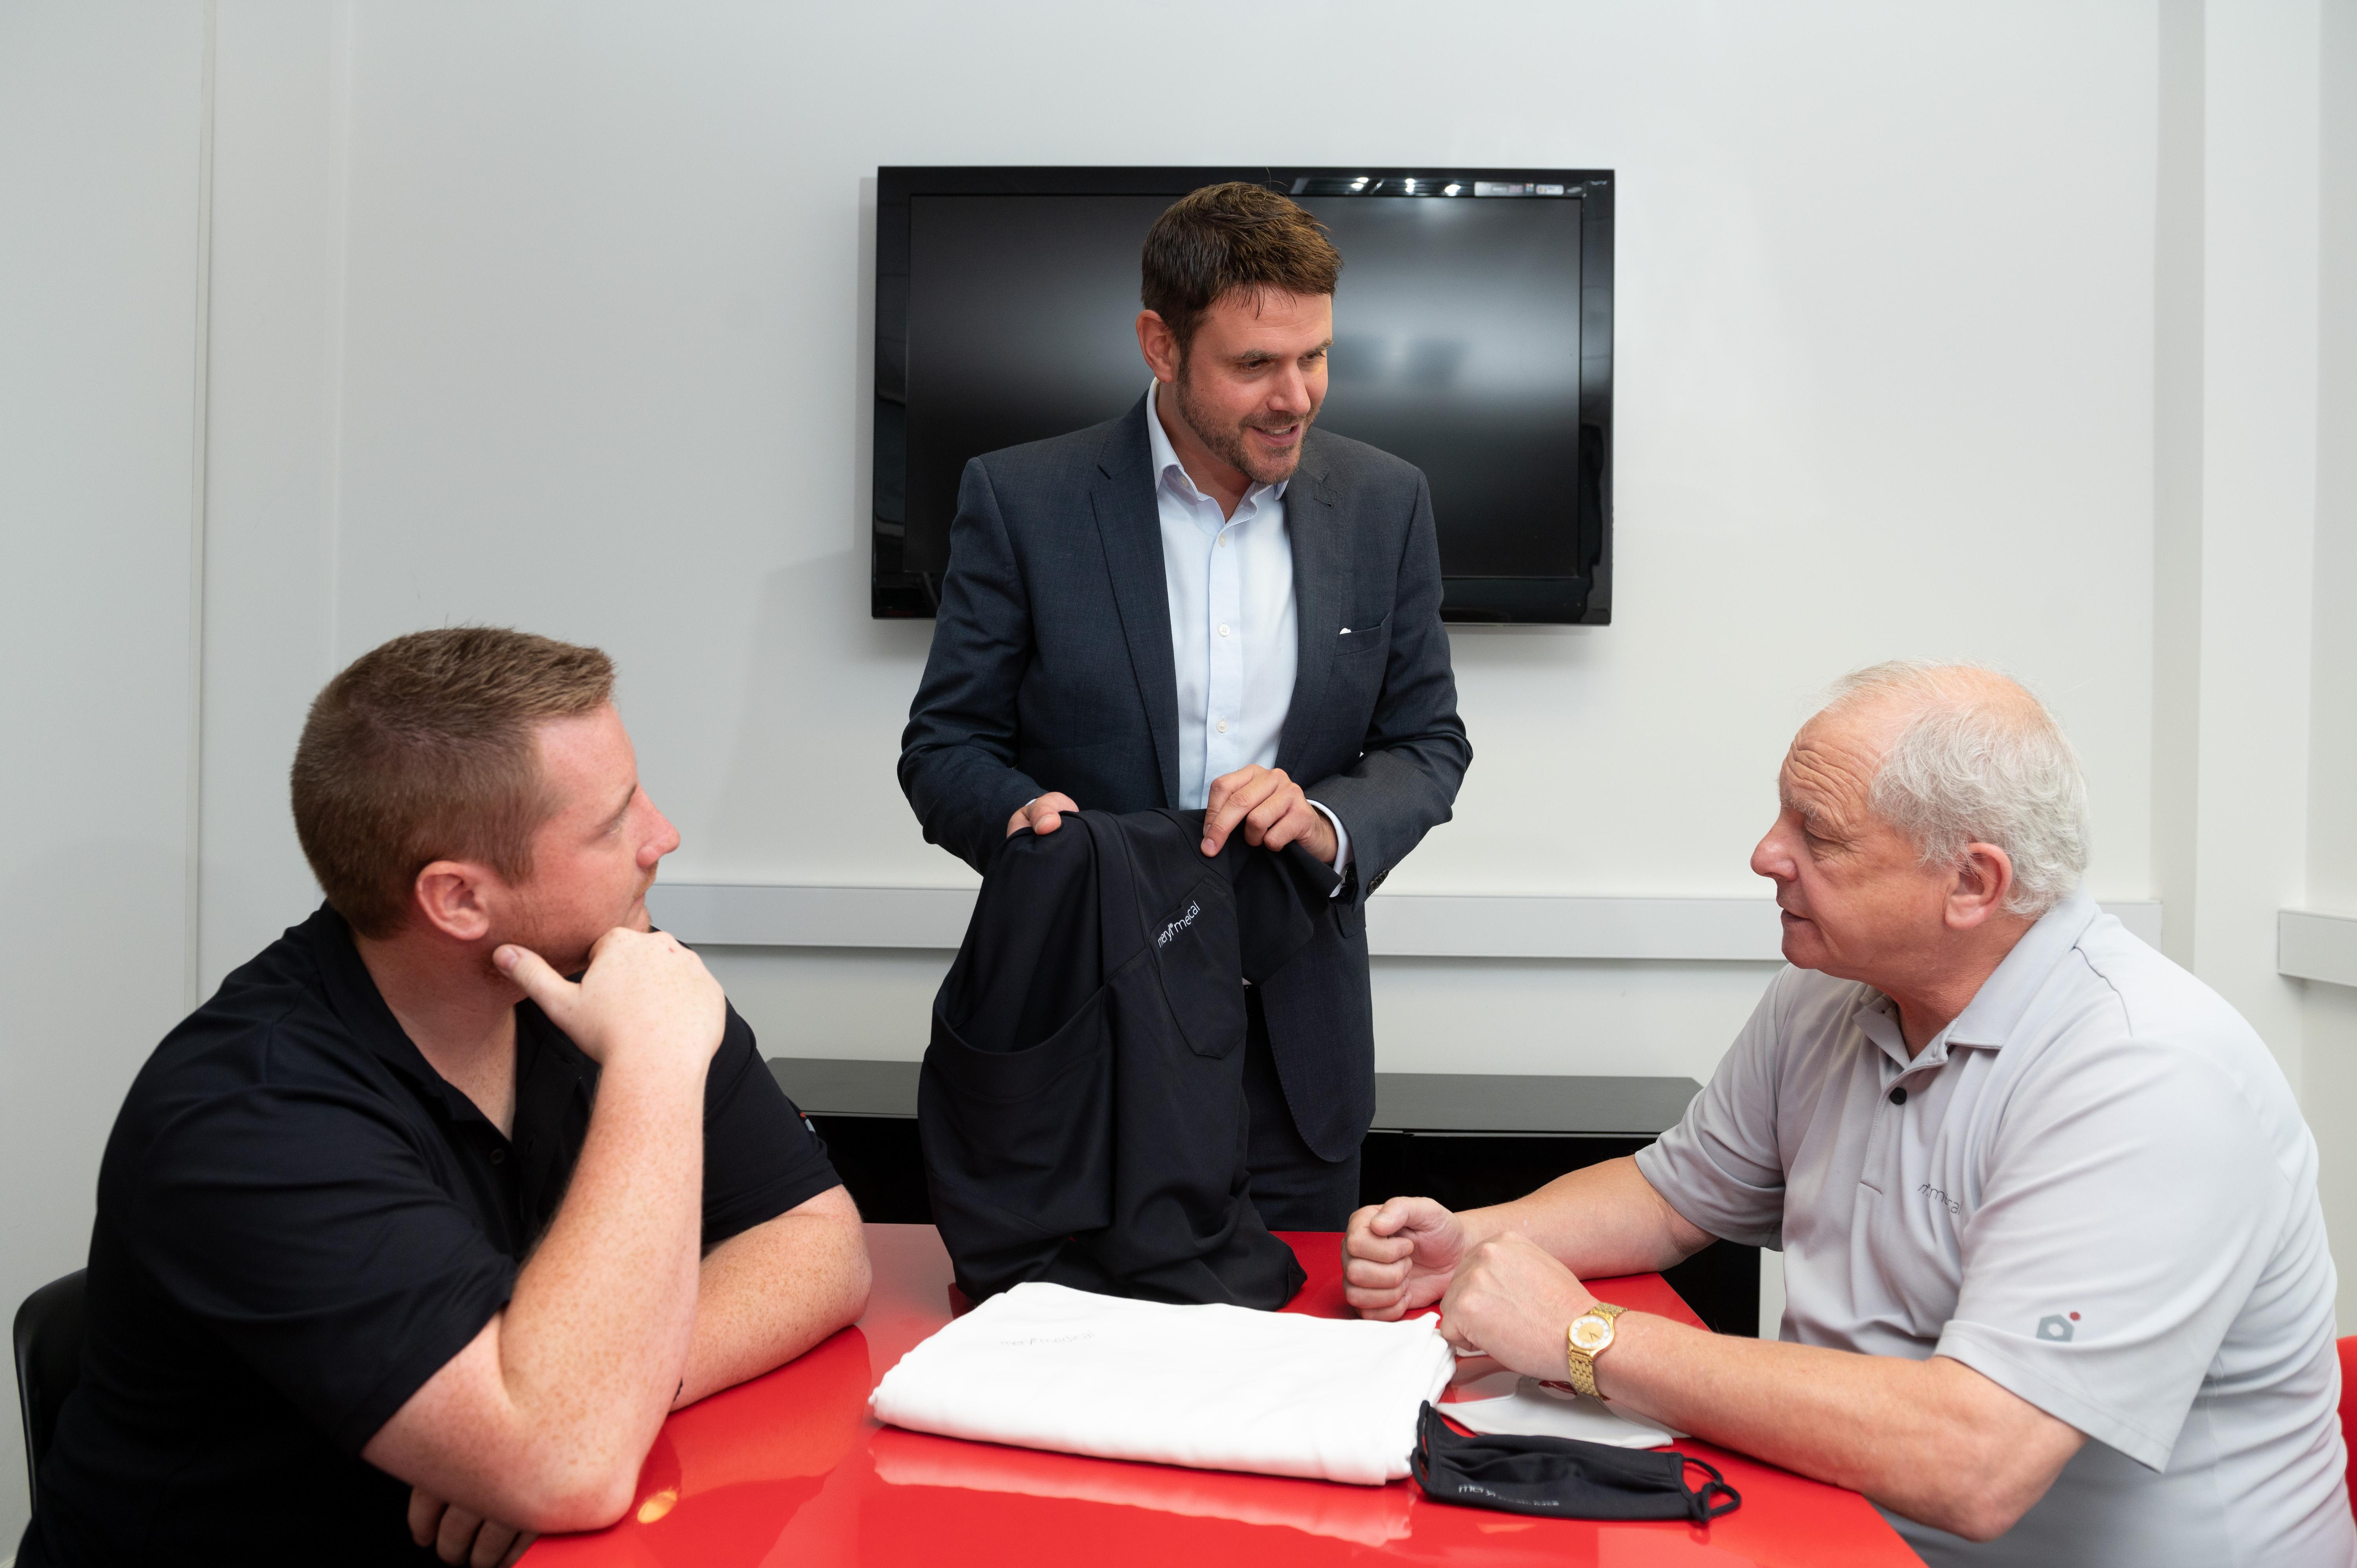 Meryl Medical Directors left to right Grant Clodd Broom Kevin Simpson and Peter Clodd Broom